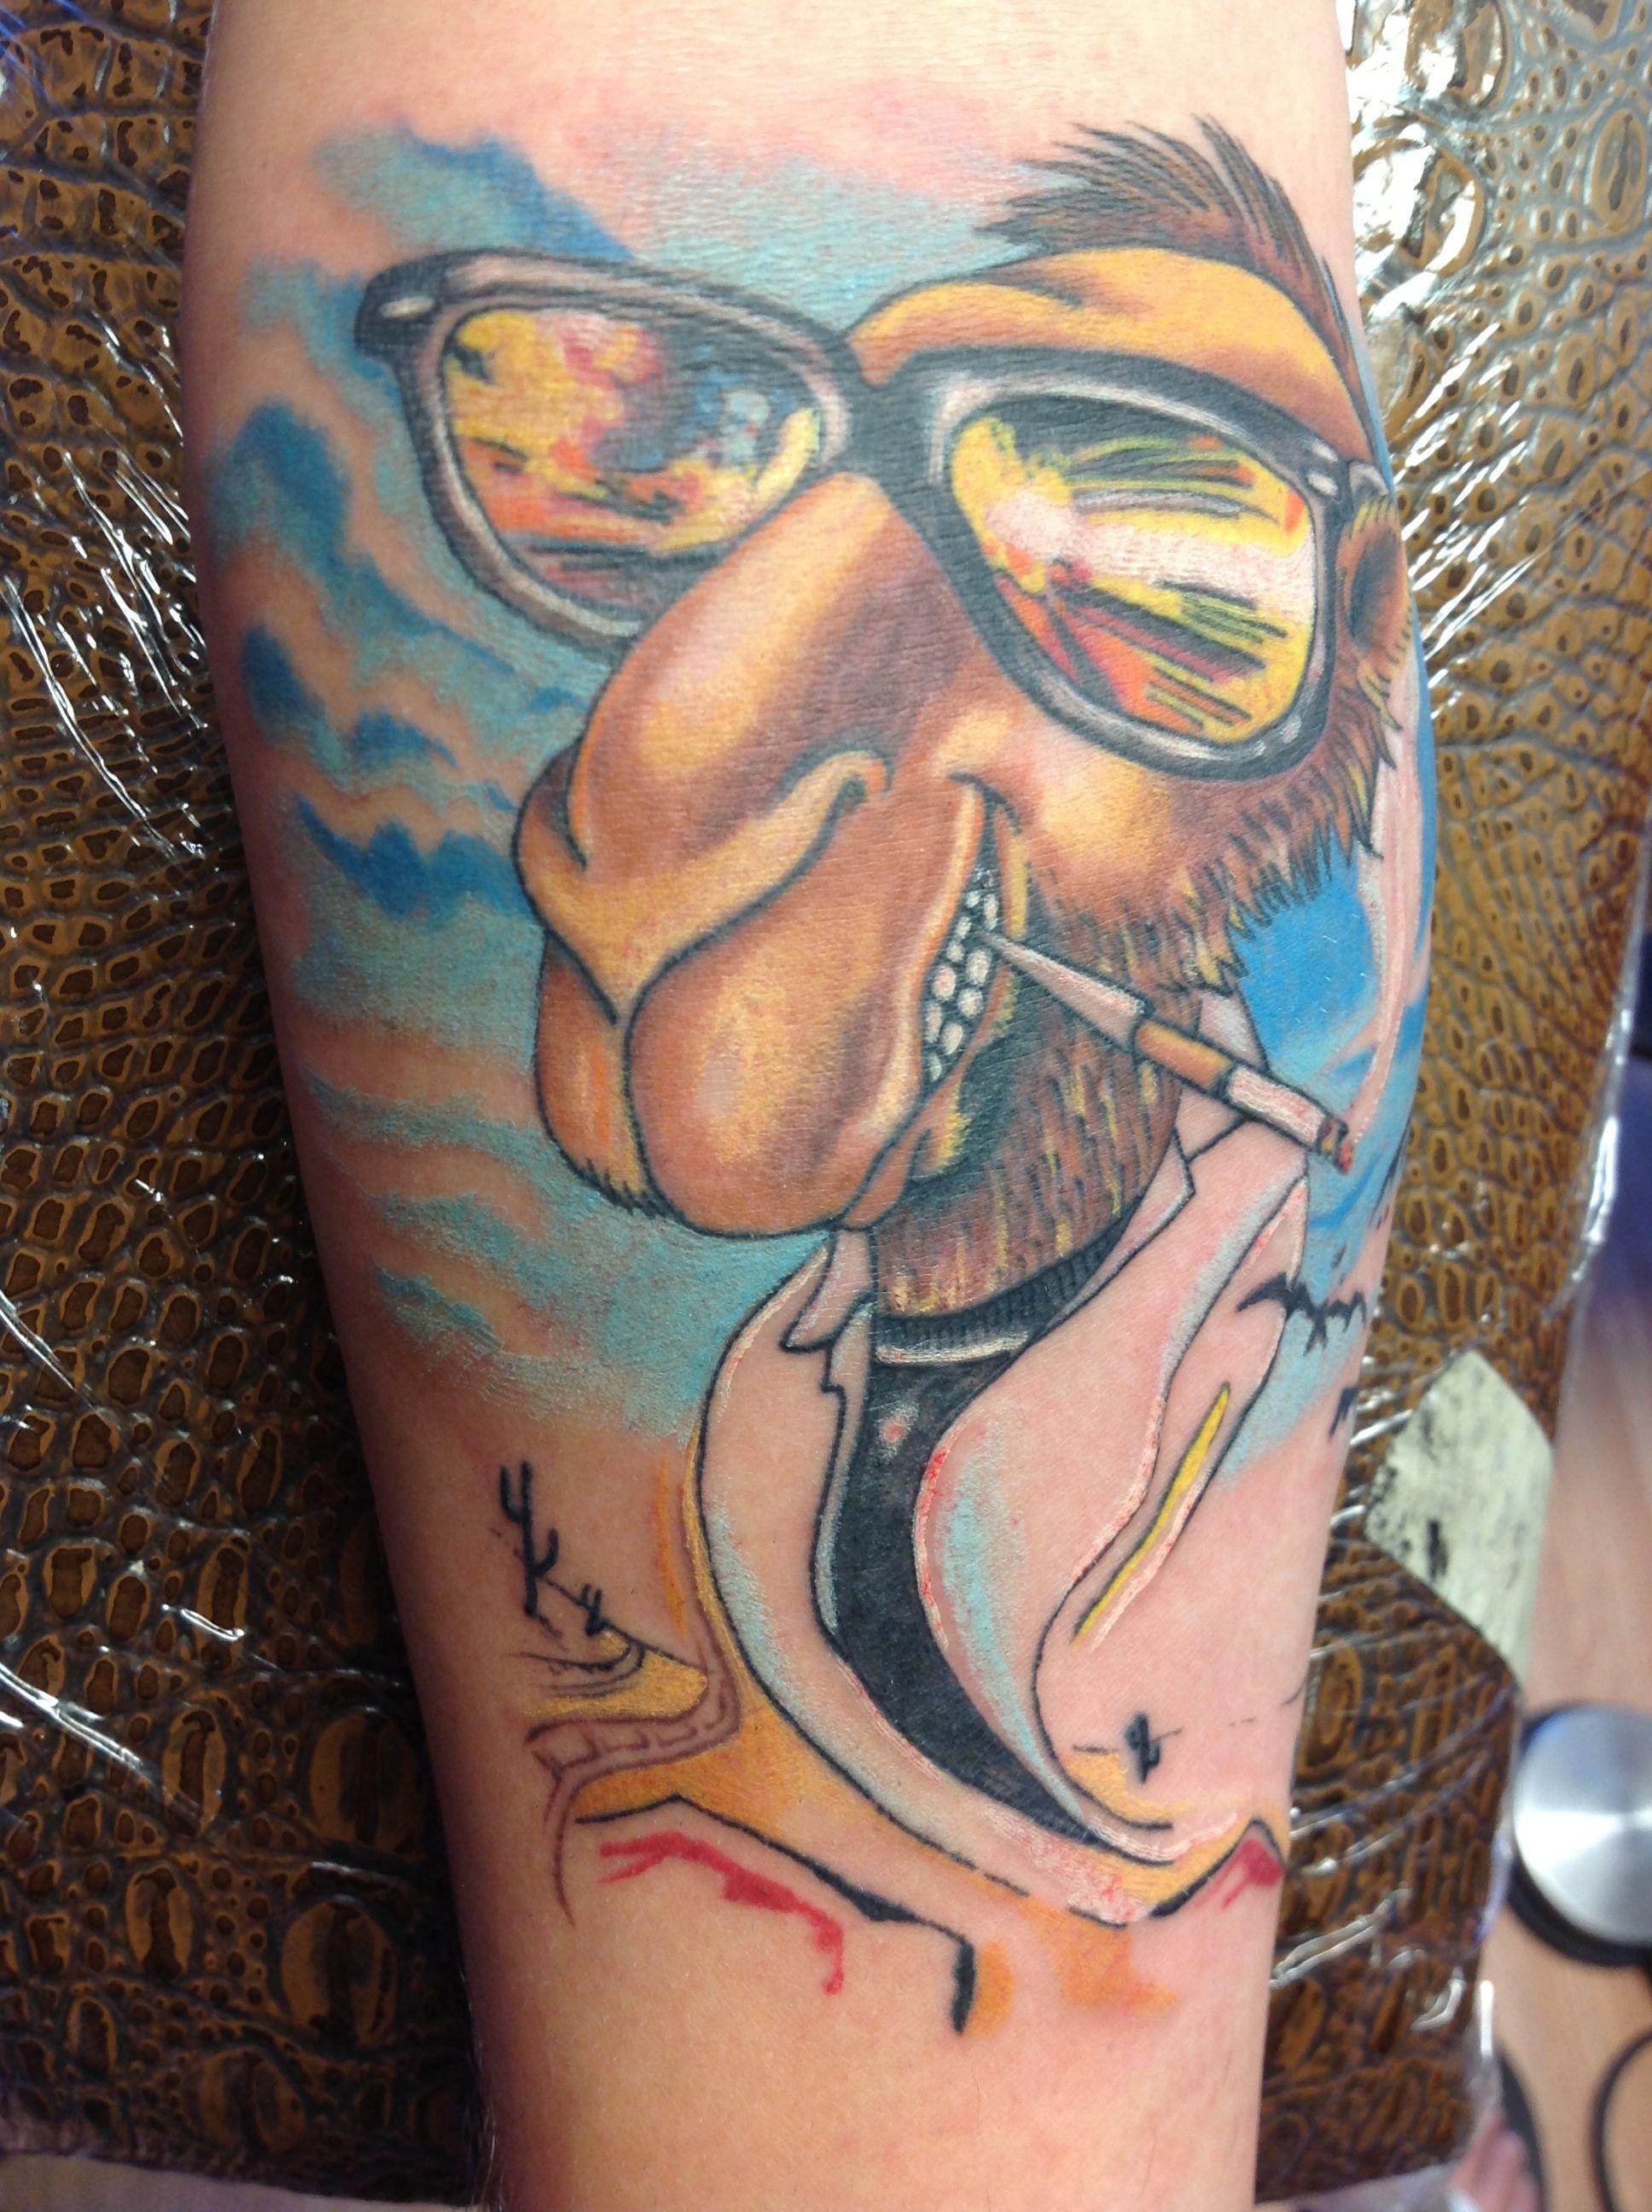 Joe camel, fear and loathing combo tattoo